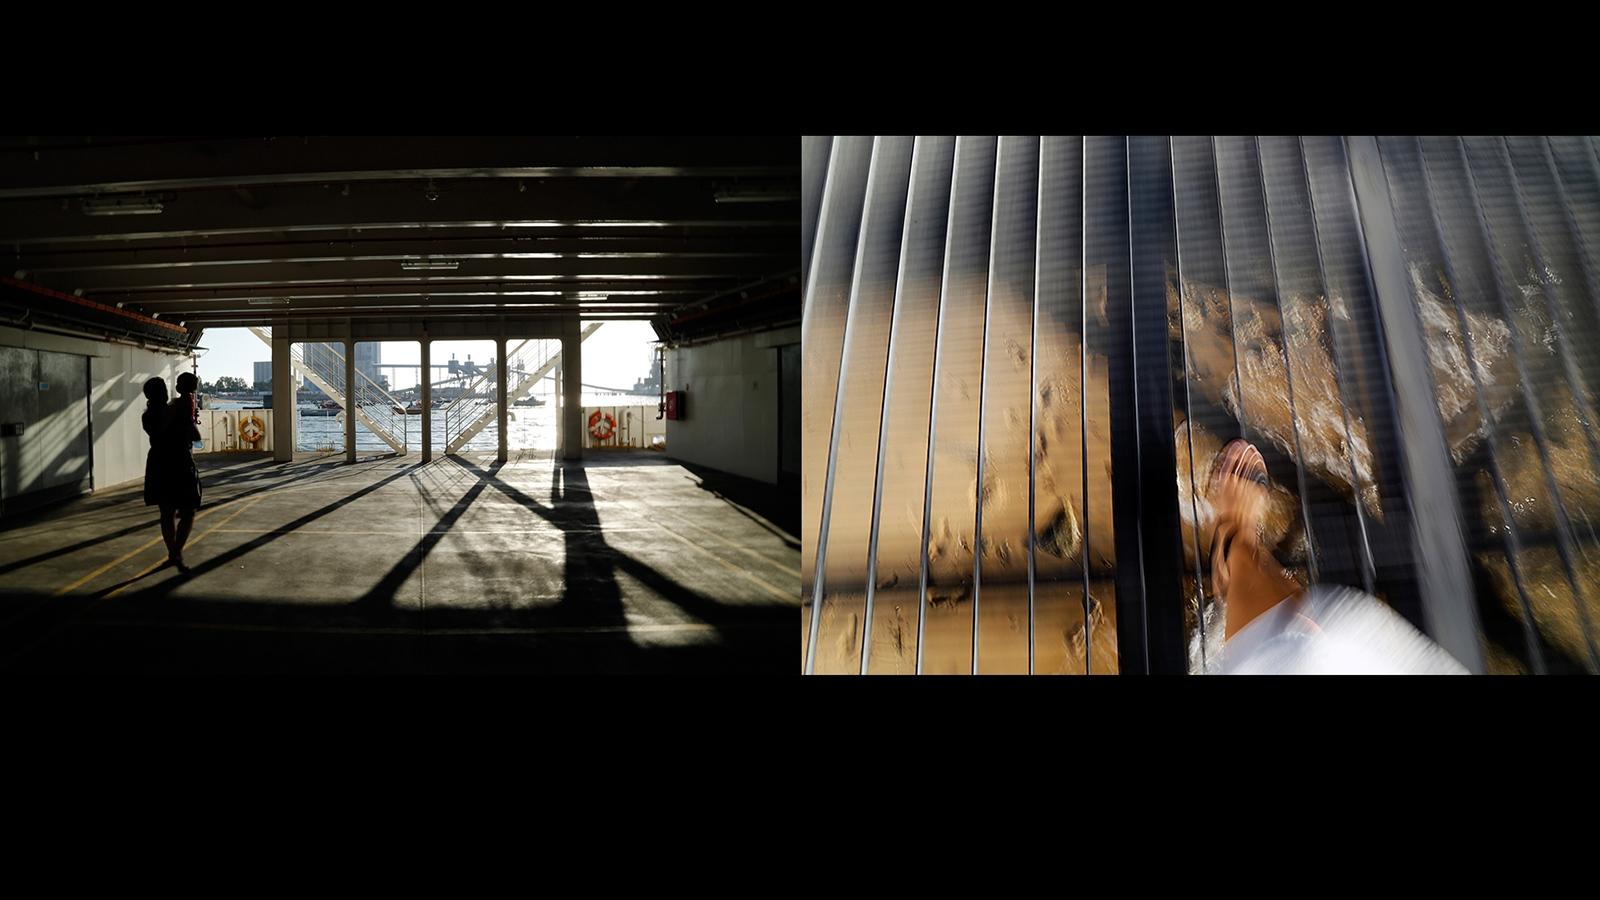 Art and Documentary Photography - Loading __TheresaOrtolani_03.jpg